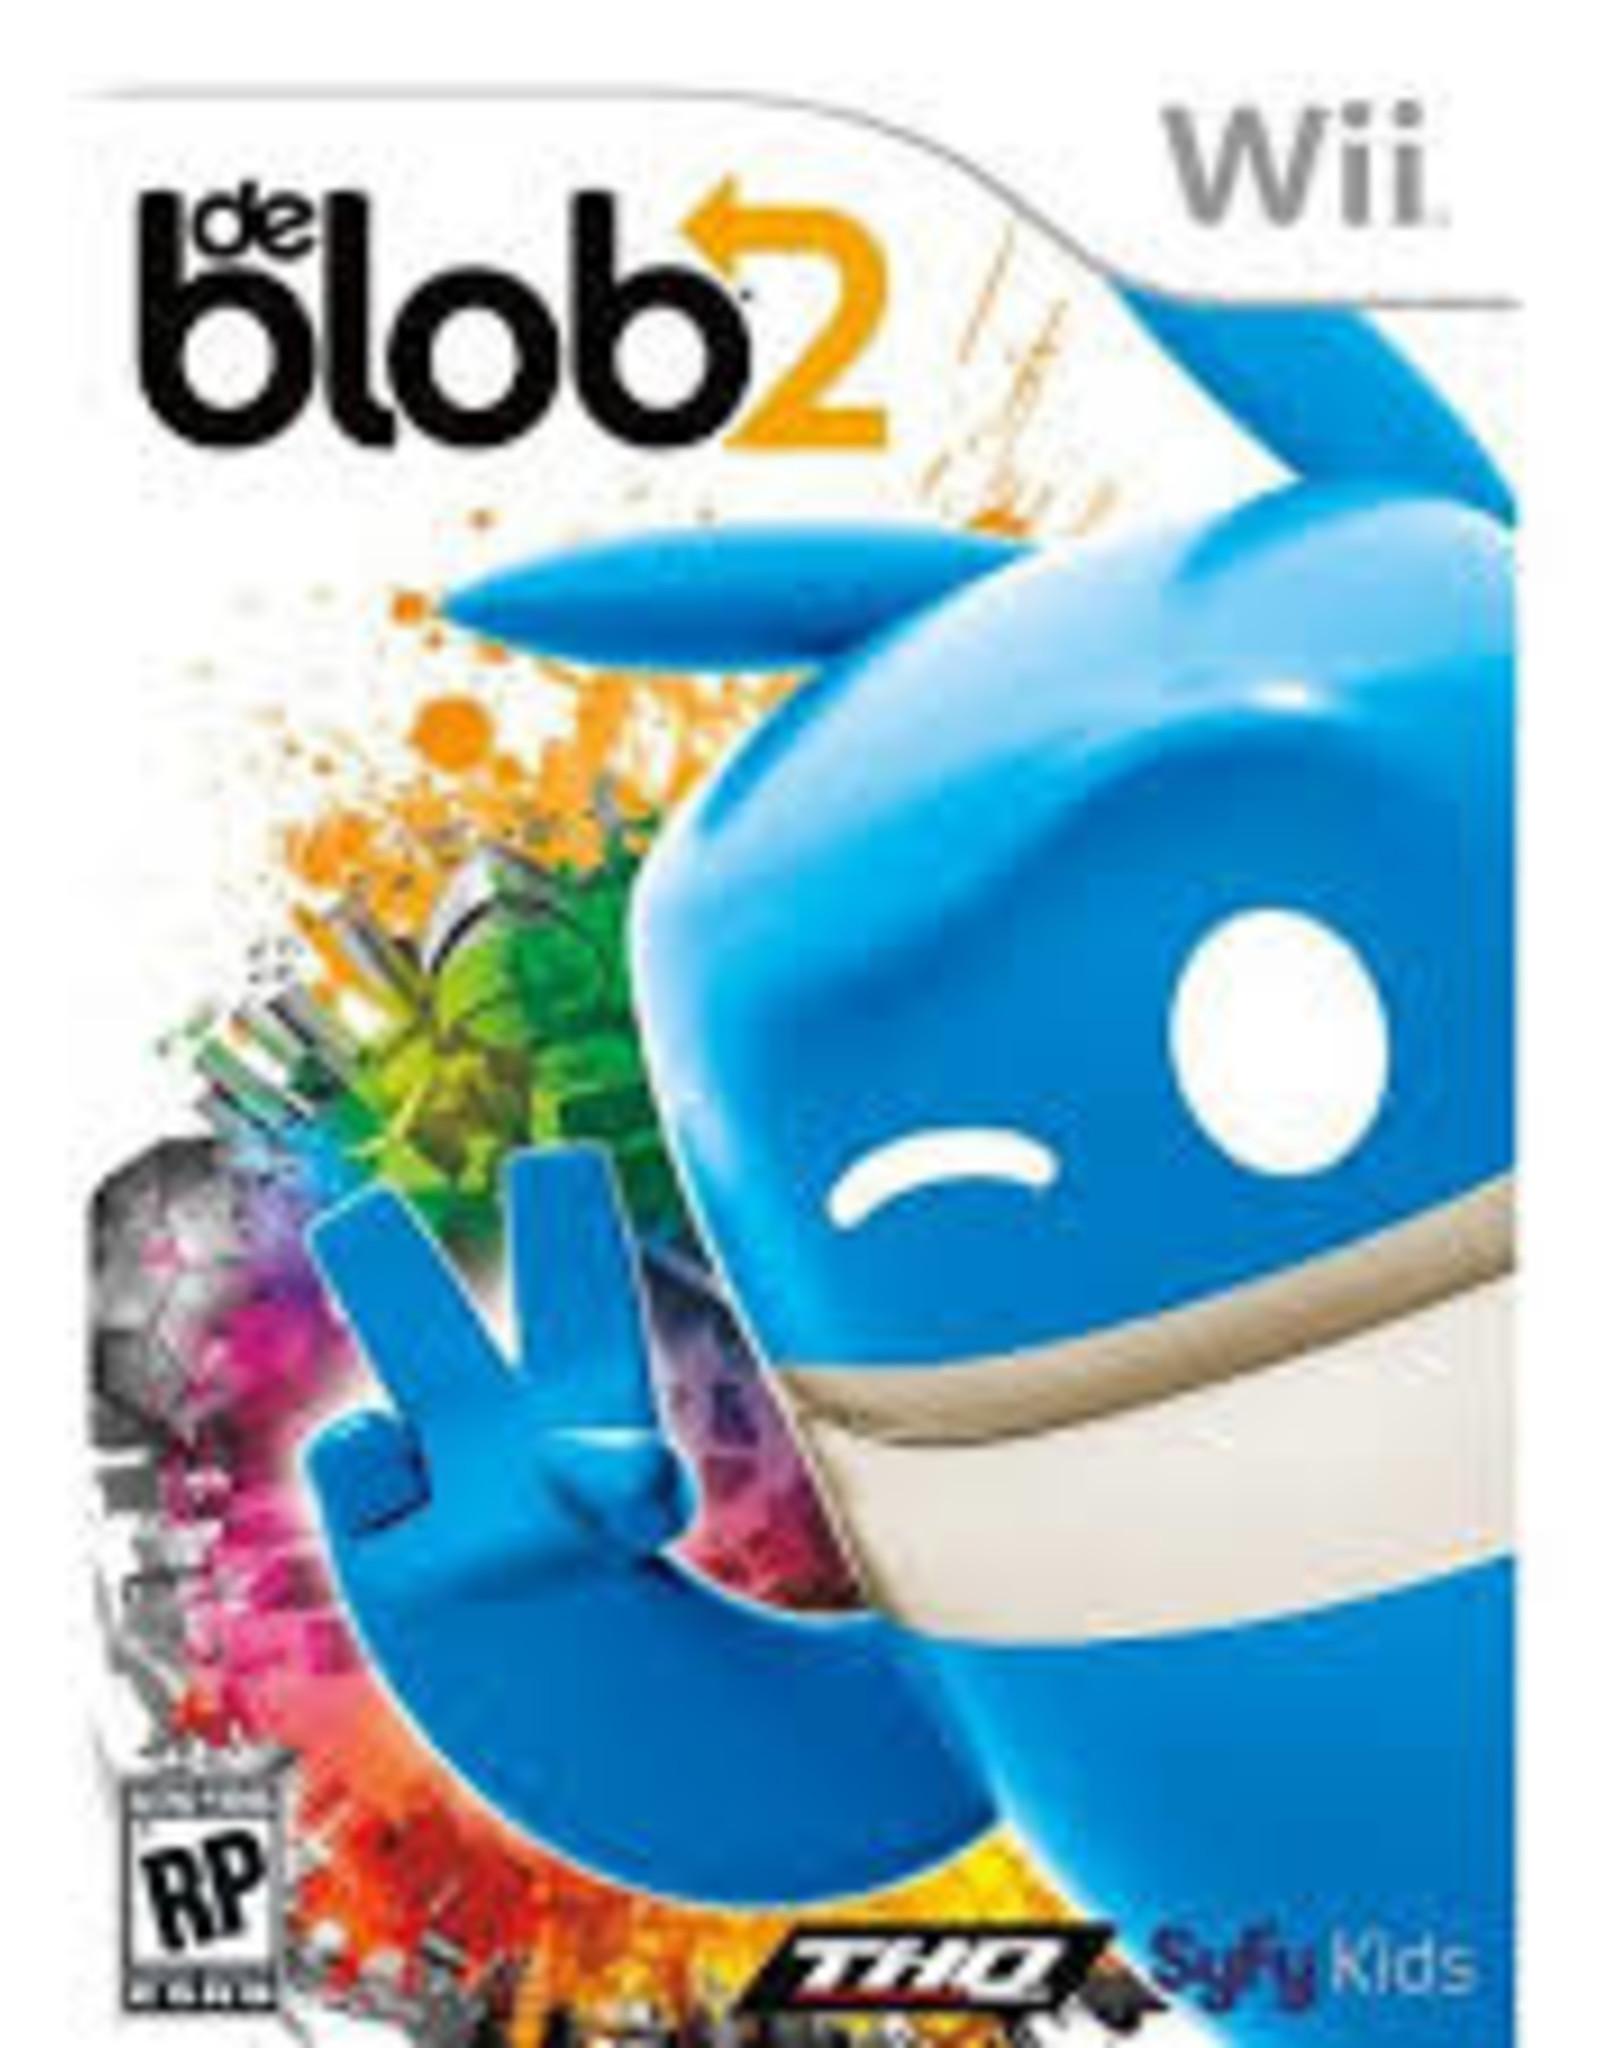 de Blob 2 - Wii PrePlayed